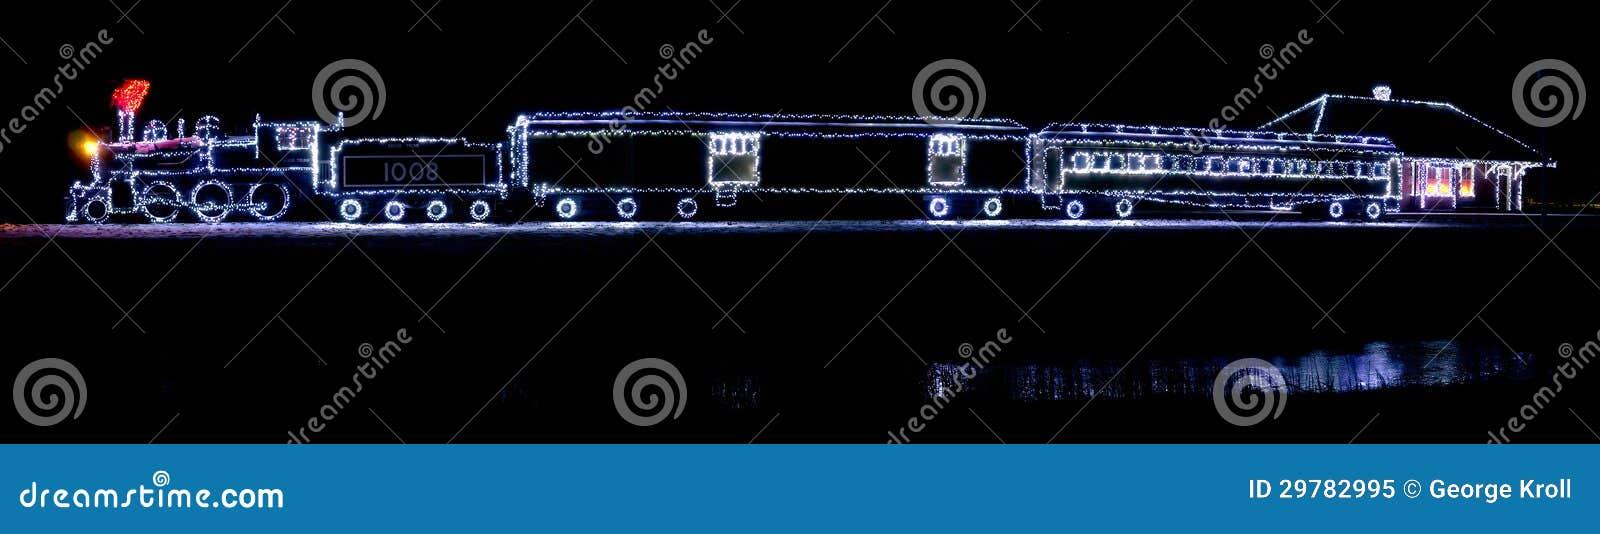 canada christmas classic lights lit morrisburg ontario train - Christmas Light Train